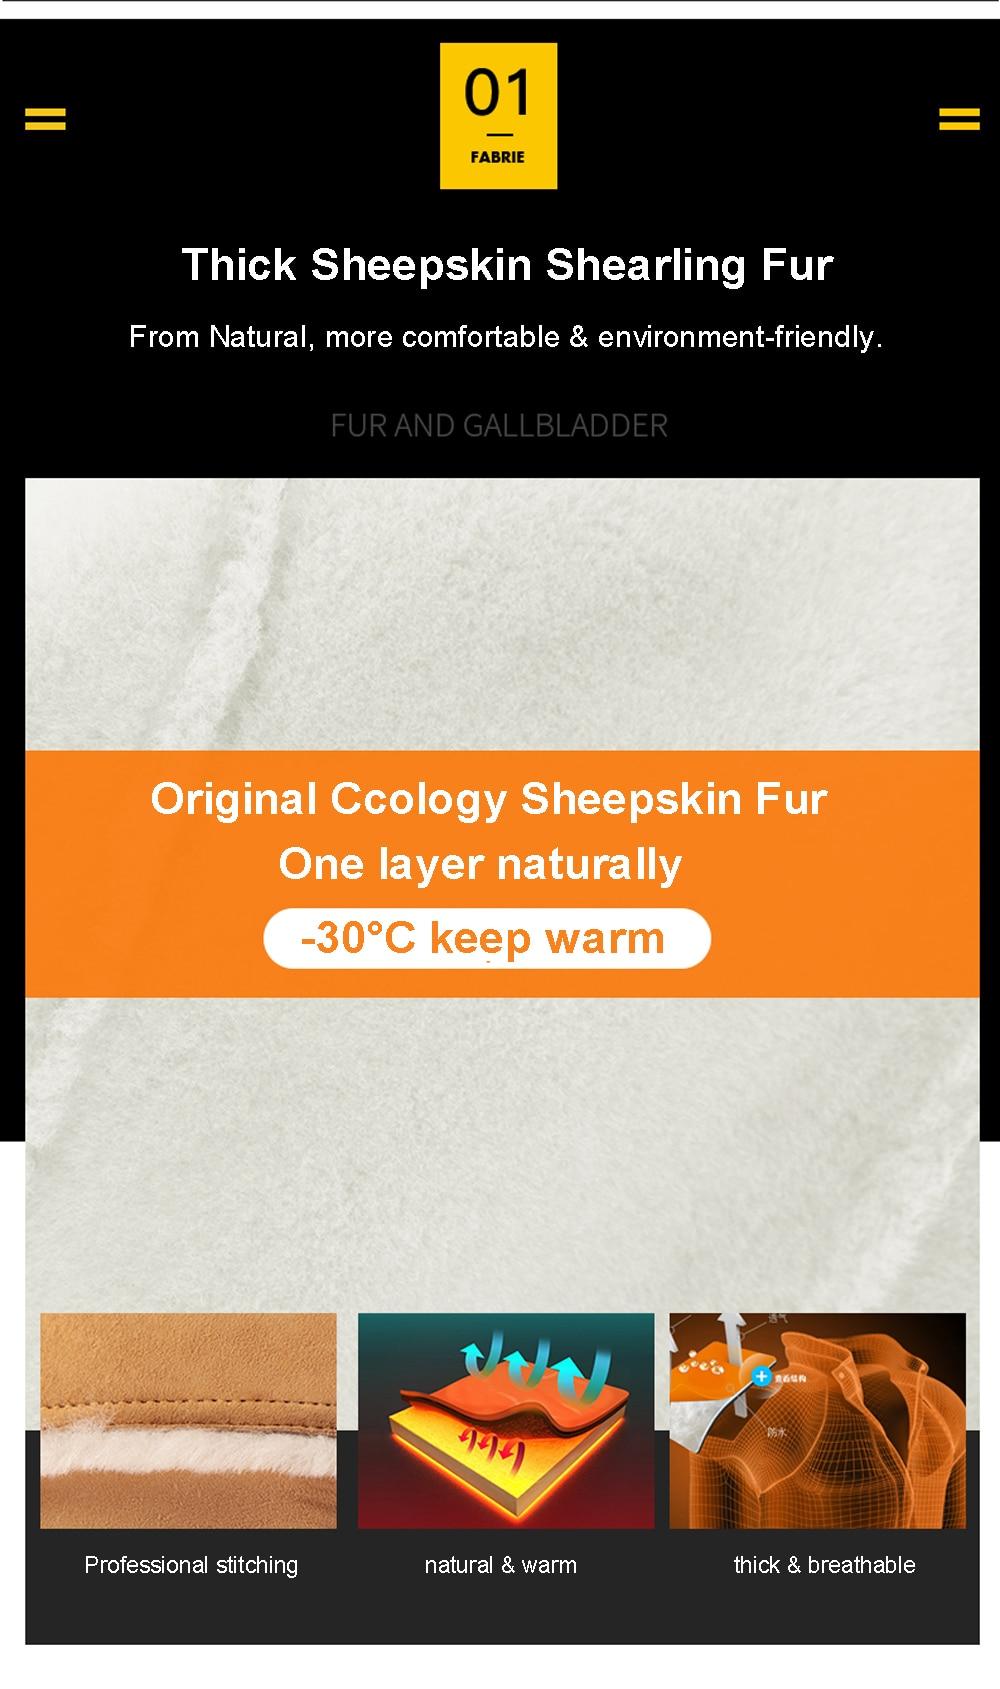 Hddf98427971d492e9d82575bf3261b26I Men Luxury Fur Shearling Coat Yellow Soft Thicken Fur Coat Winter Male Formal Business Fur Sheepskin Jackets